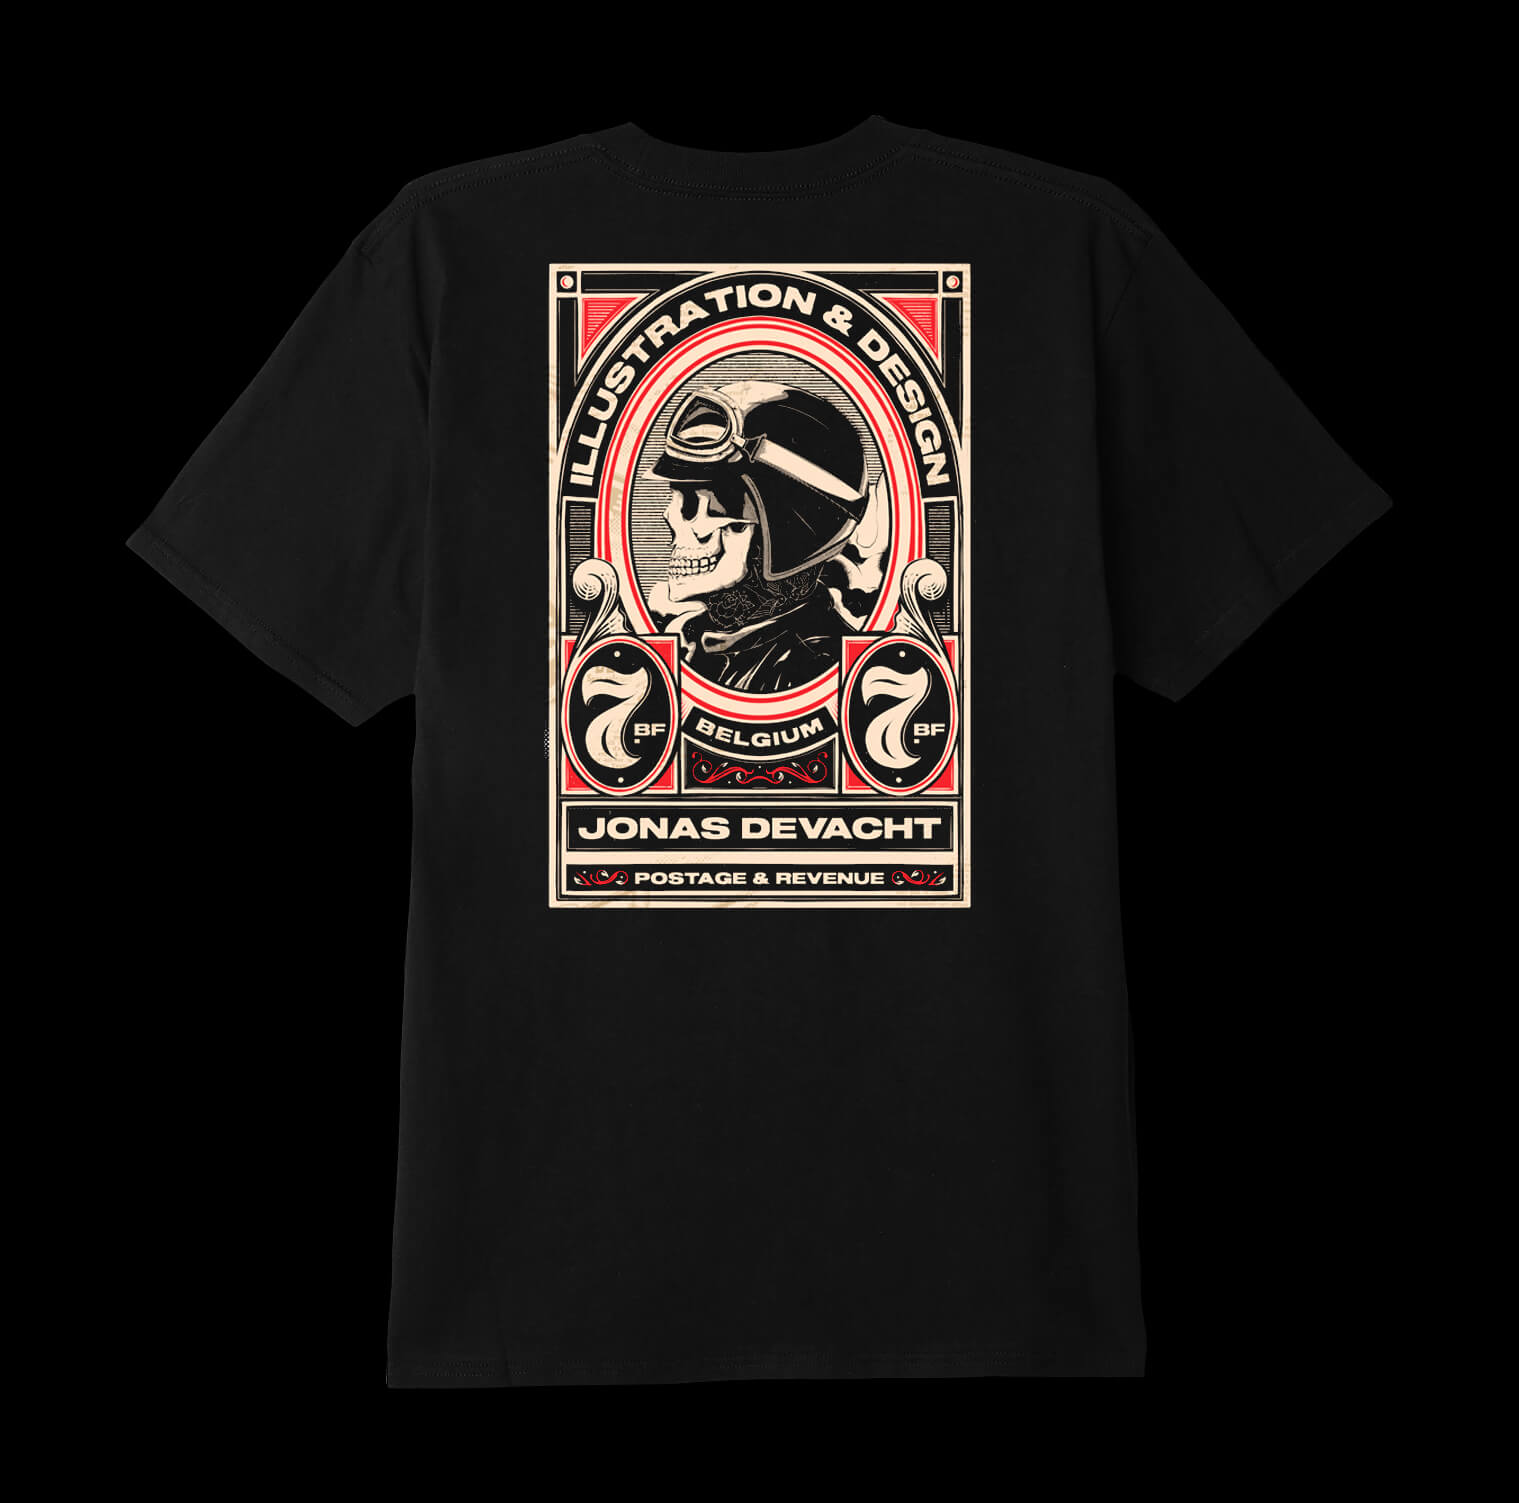 Personal Branding Shirts